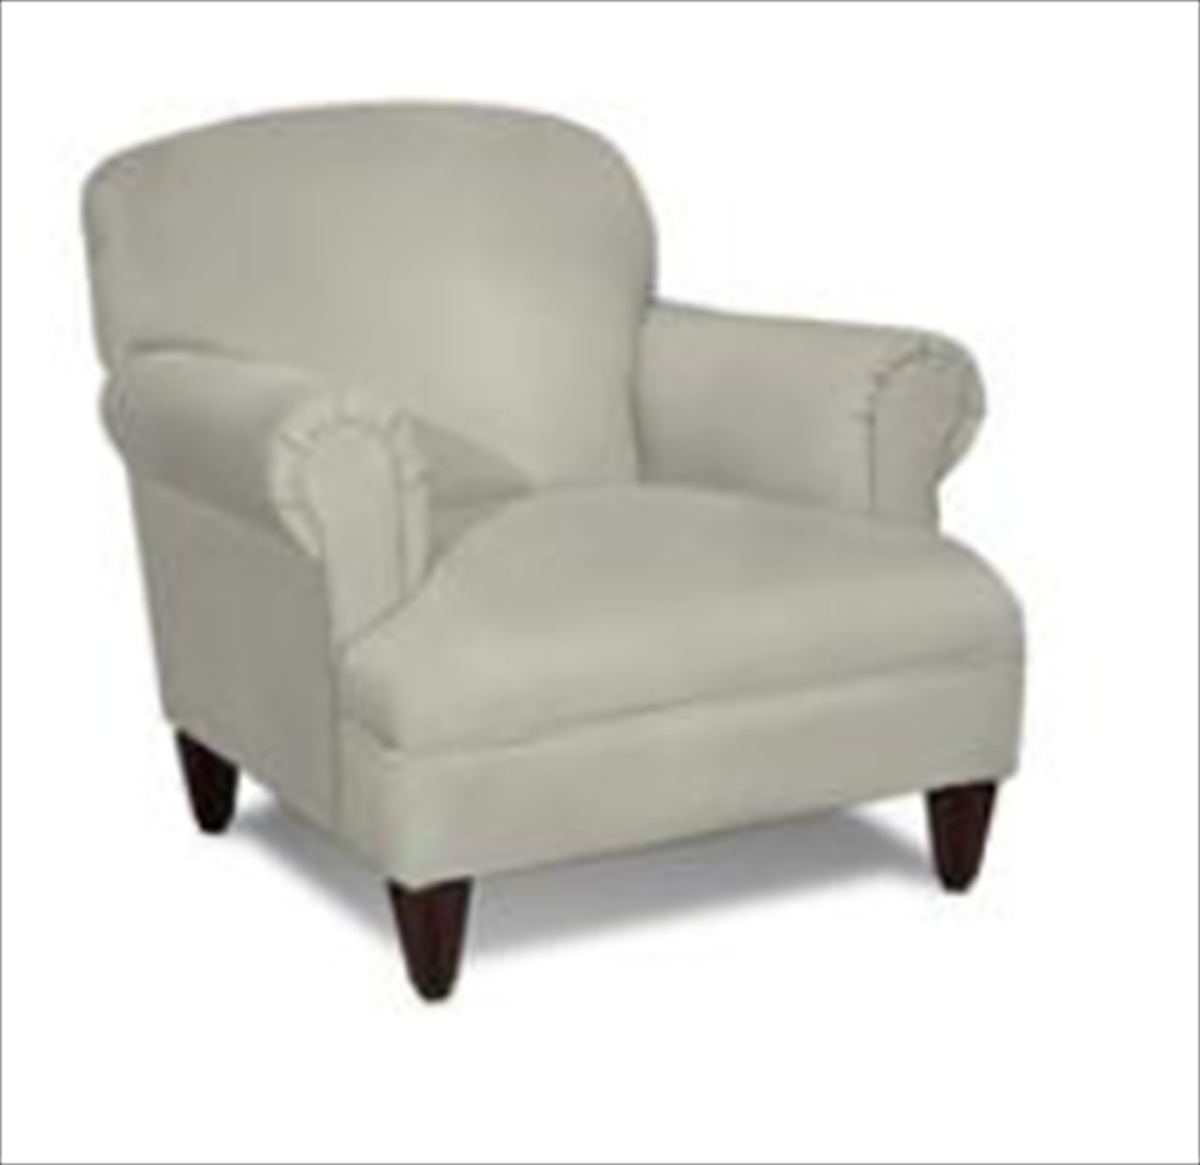 Klaussner Wrigley Chair - Belsire Grey